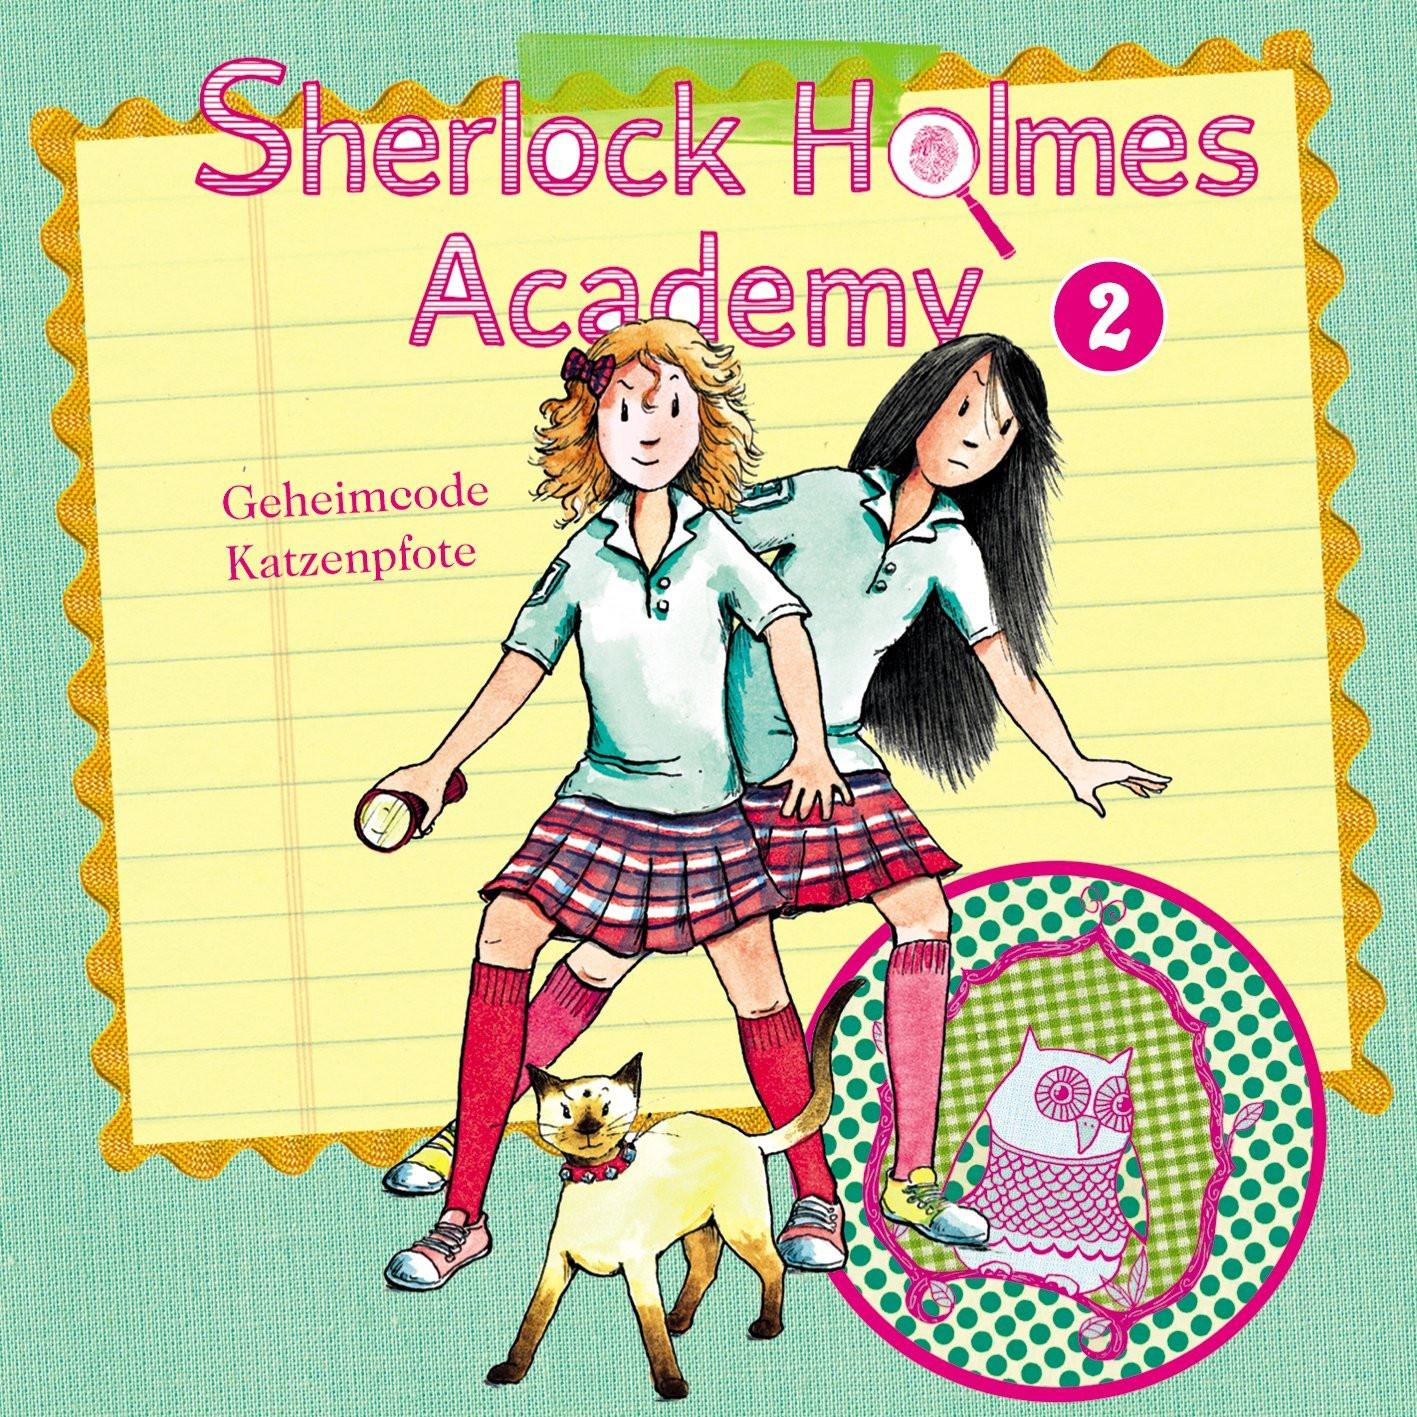 Sherlock Holmes Academy 02: Geheimcode Katzenpfote